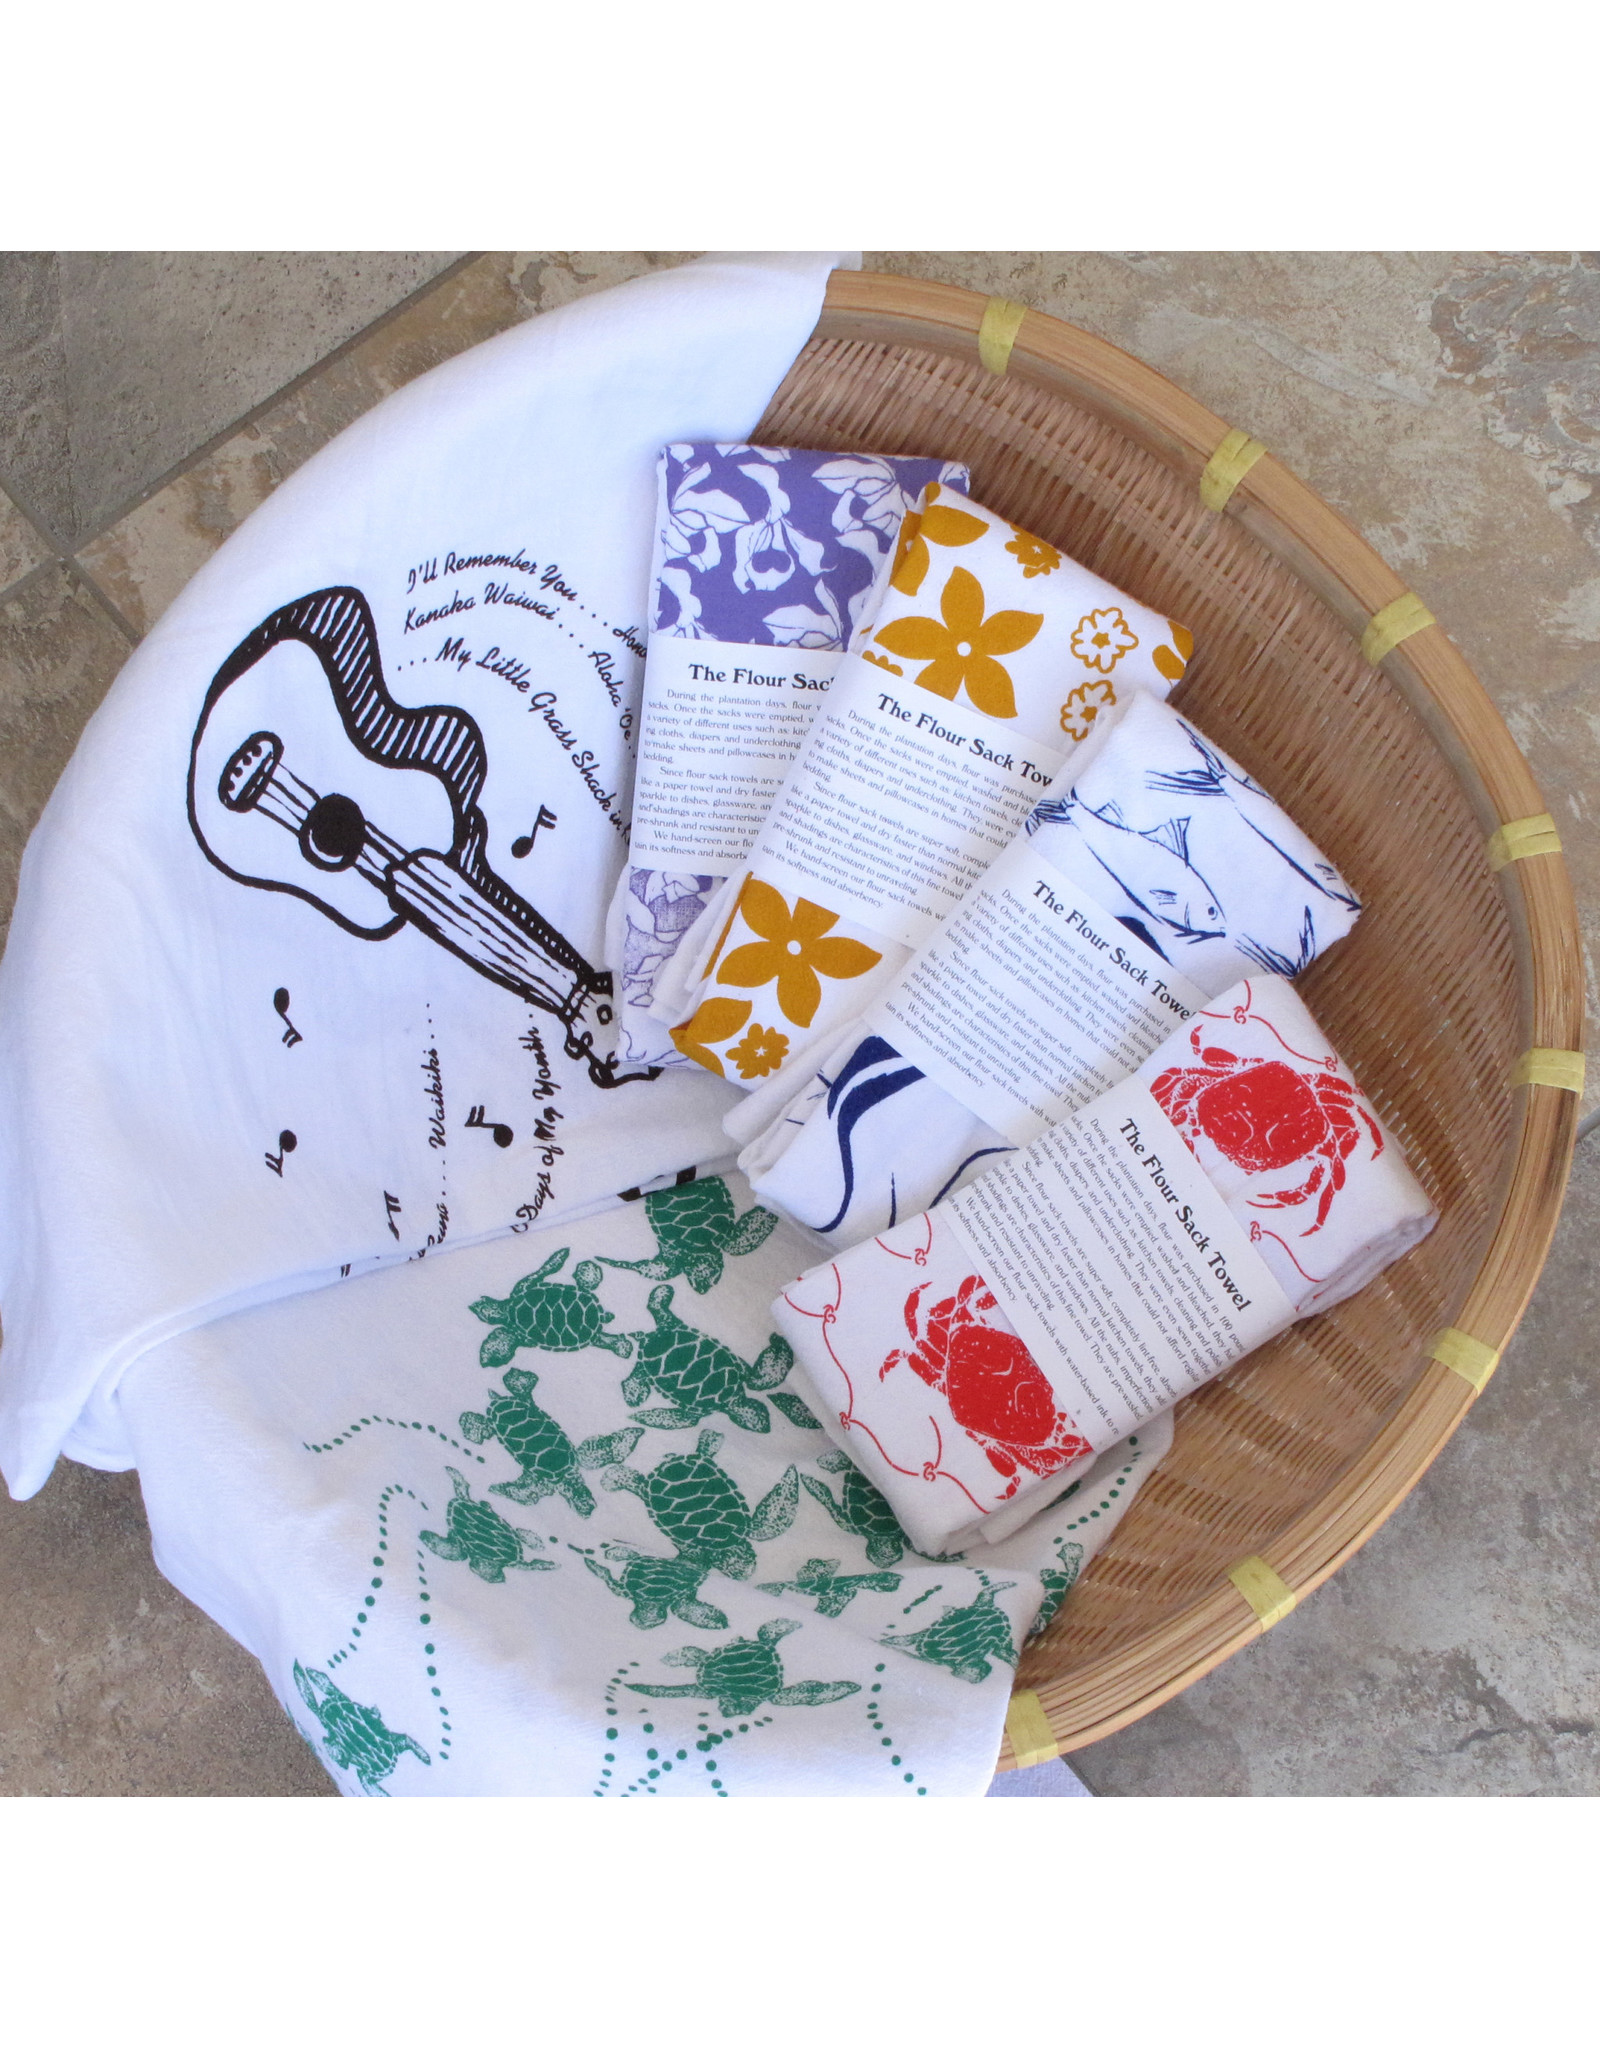 Downtown General Store Flour Sack Towels